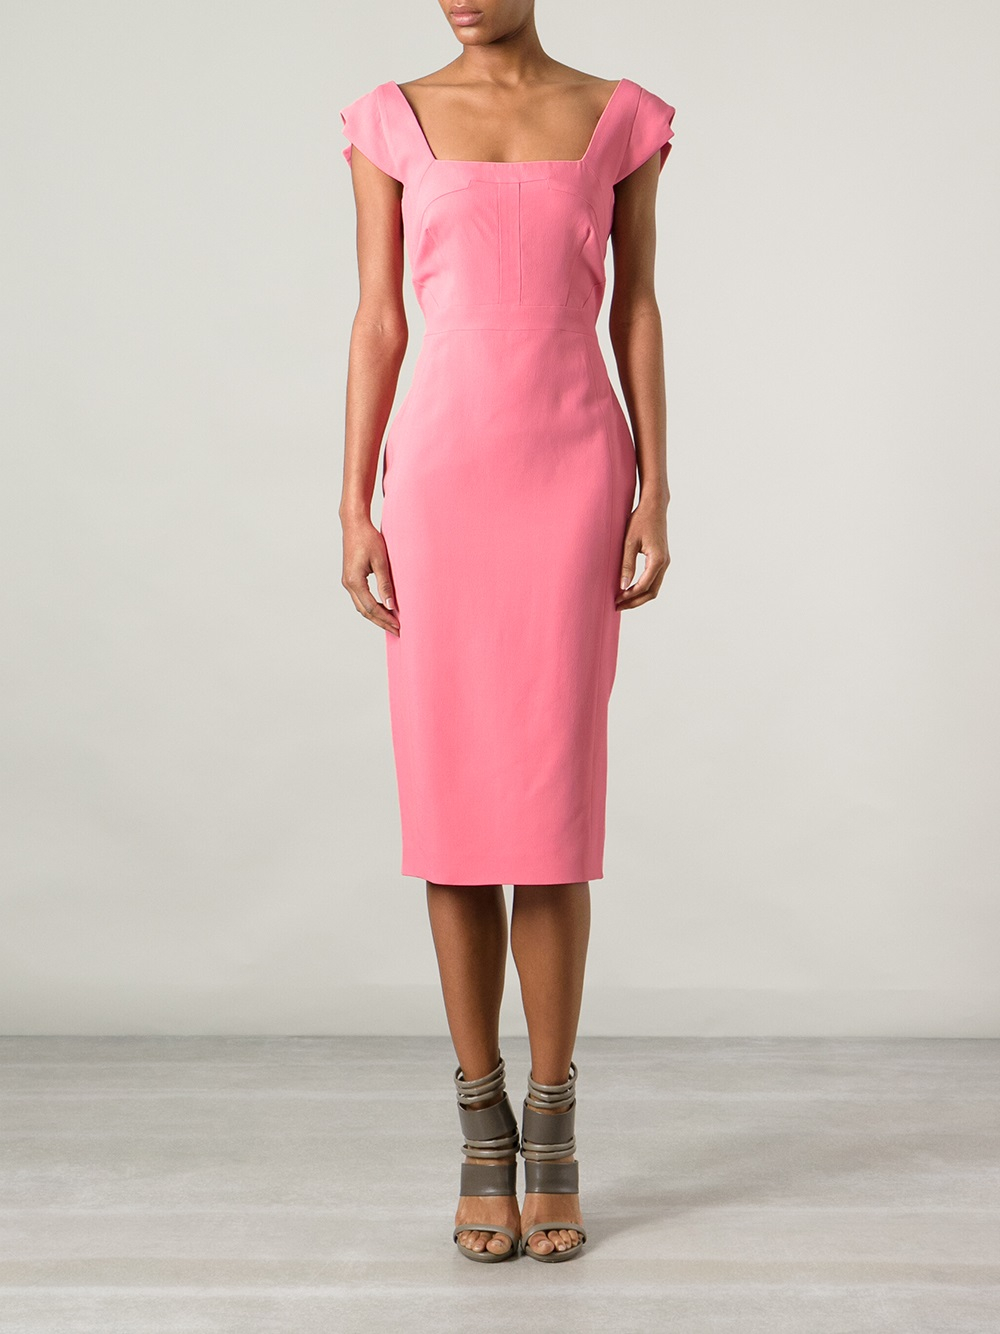 Antonio berardi Fitted Dress in Pink - Lyst